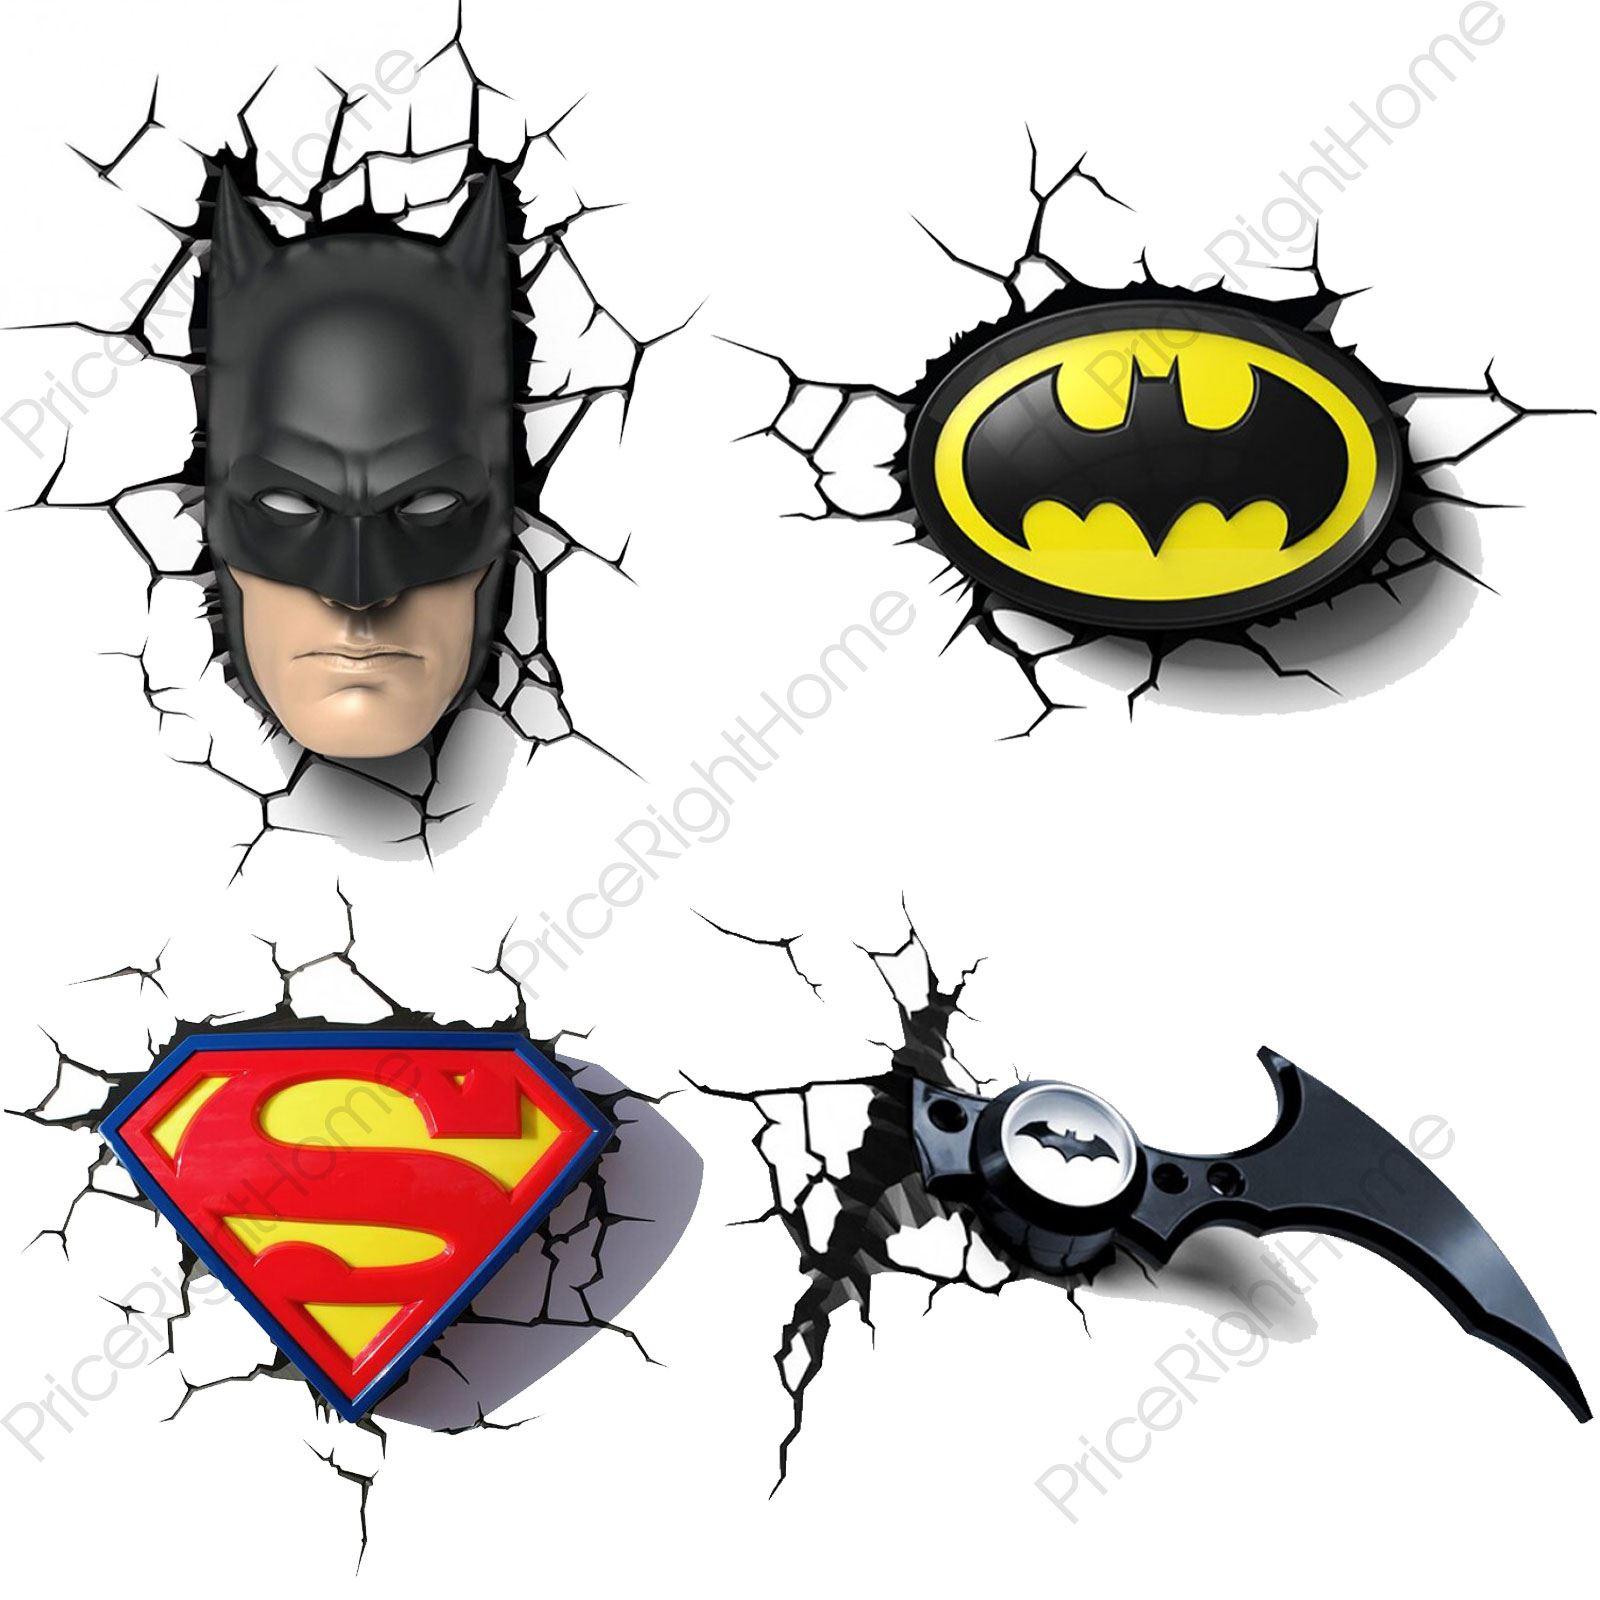 3d Wall Light Toys R Us : DC COMICS BATMAN & SUPERMAN 3D WALL LIGHTS NIGHTLIGHT BEDROOM LIGHTING FREE P+P eBay